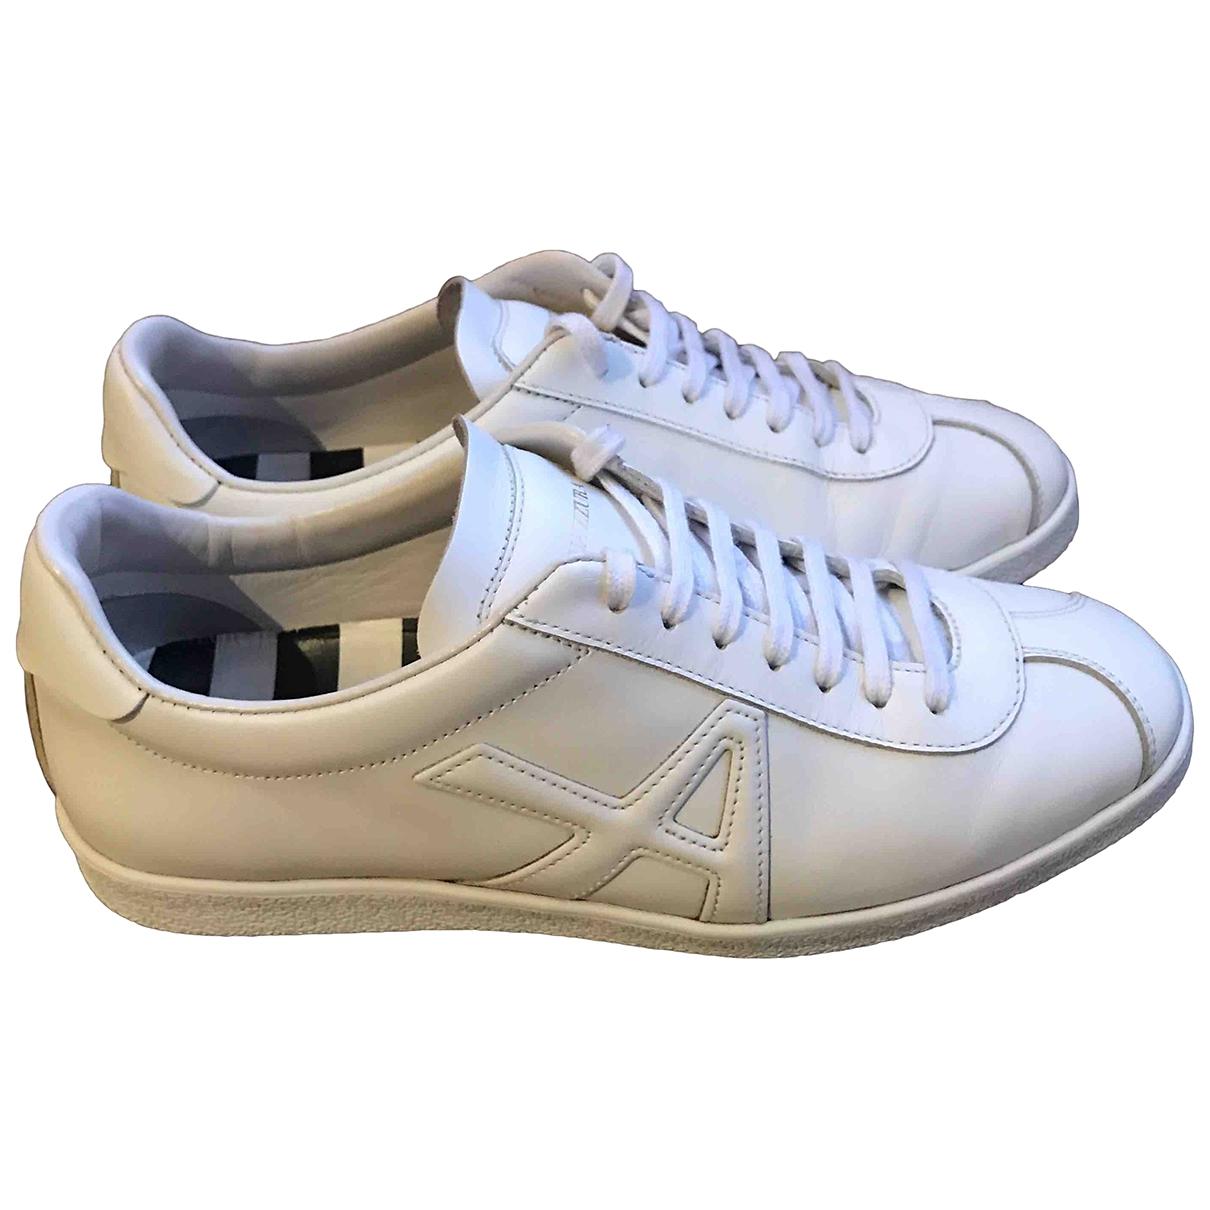 Aquazzura \N White Leather Trainers for Women 36 IT